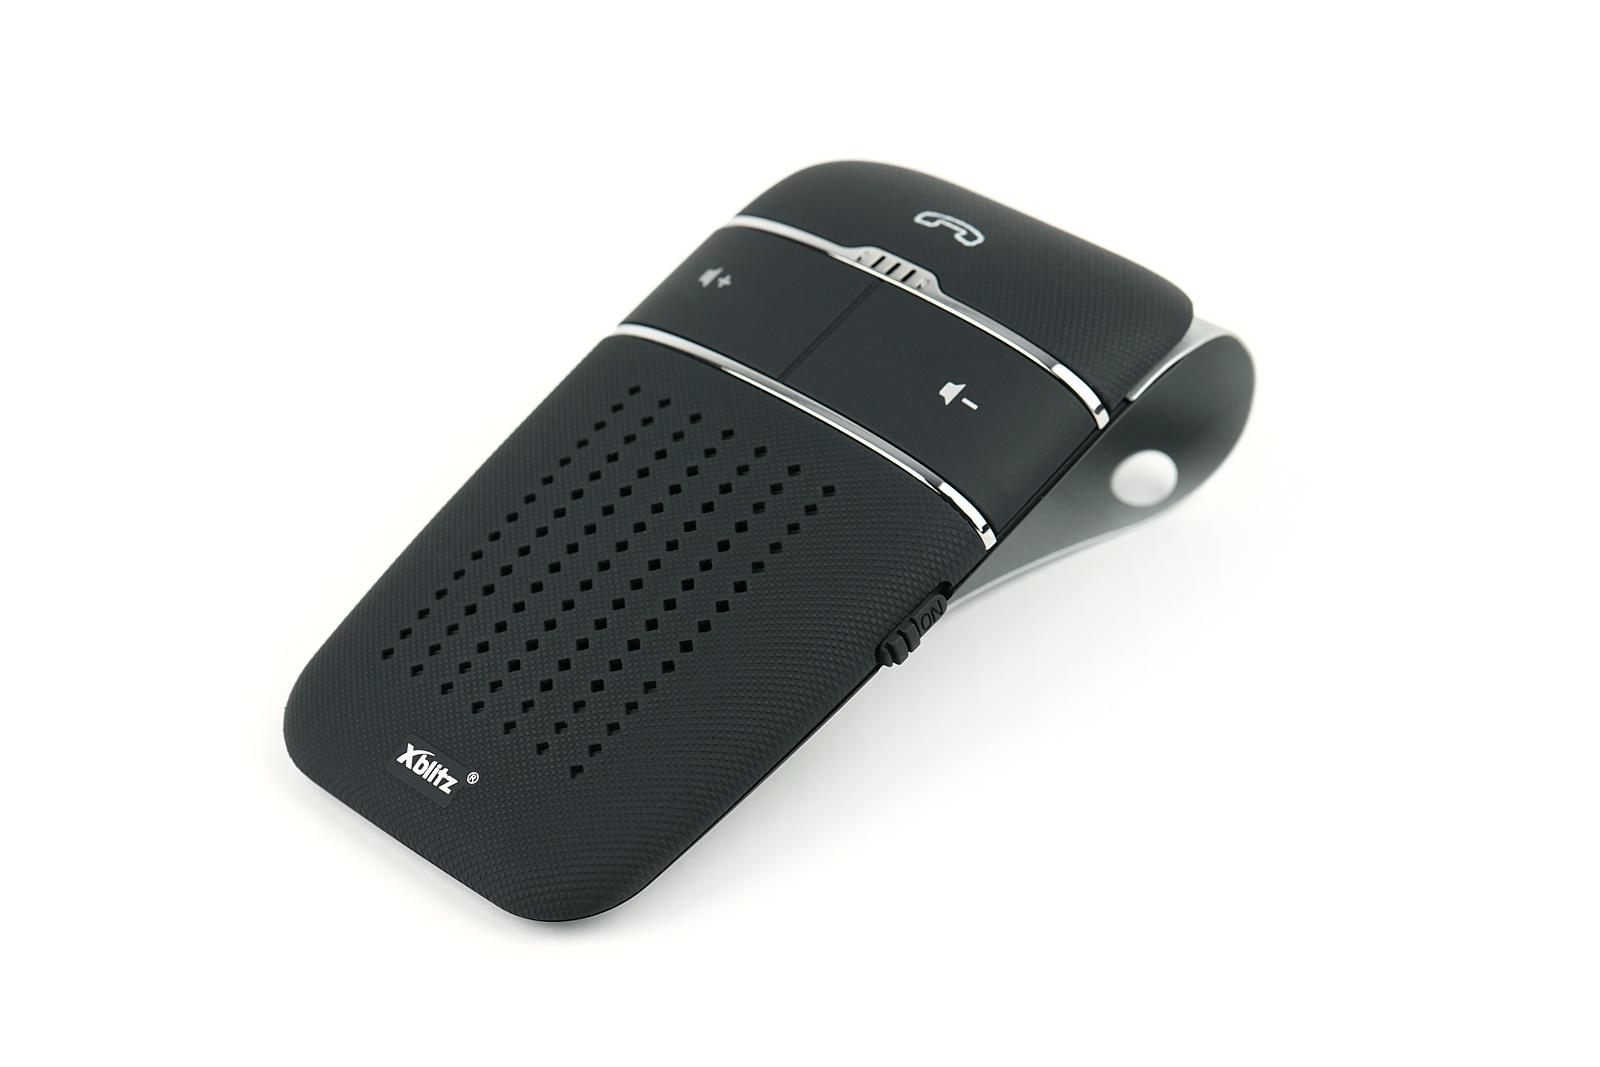 Naprava za prostoročno telefoniranje XBLITZ X600